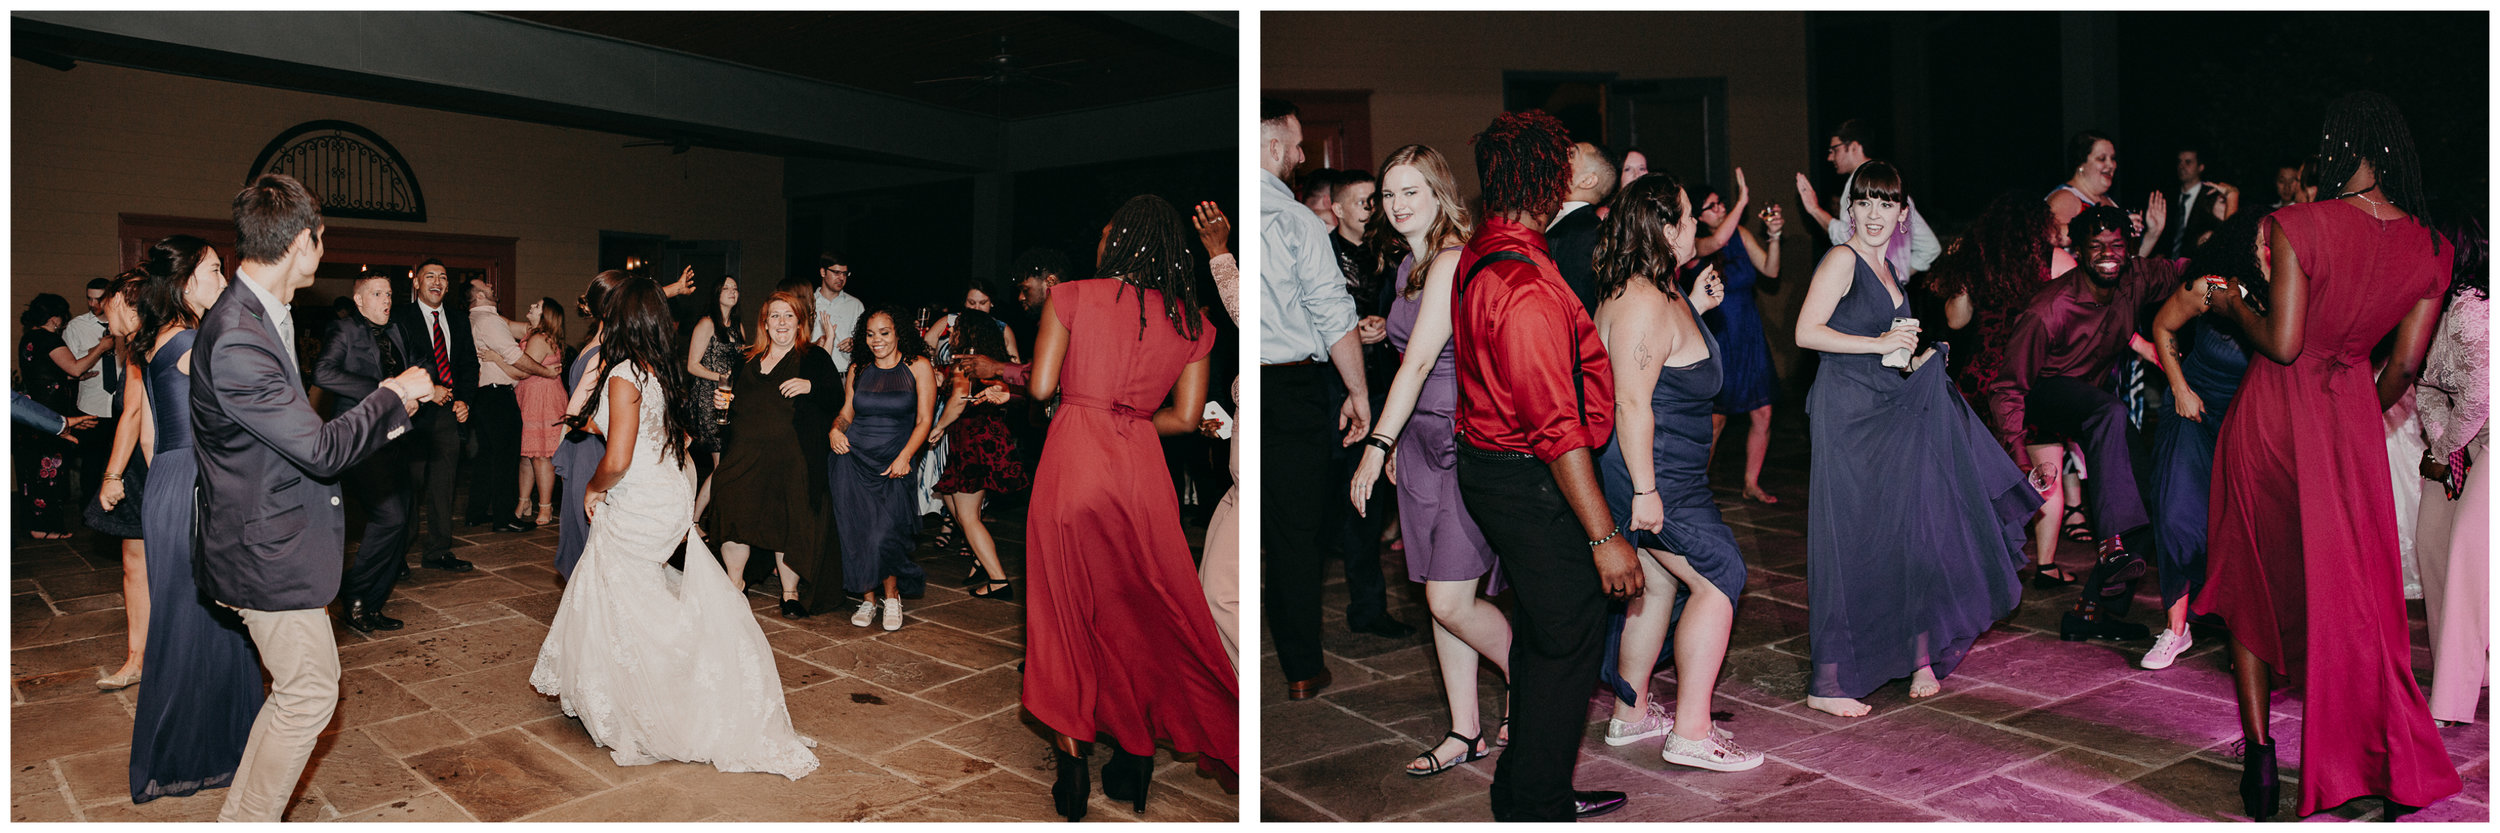 94- Kaya_vineyard_dahlonega_wedding_venue_detais_reception_aline_marin_photography.jpg